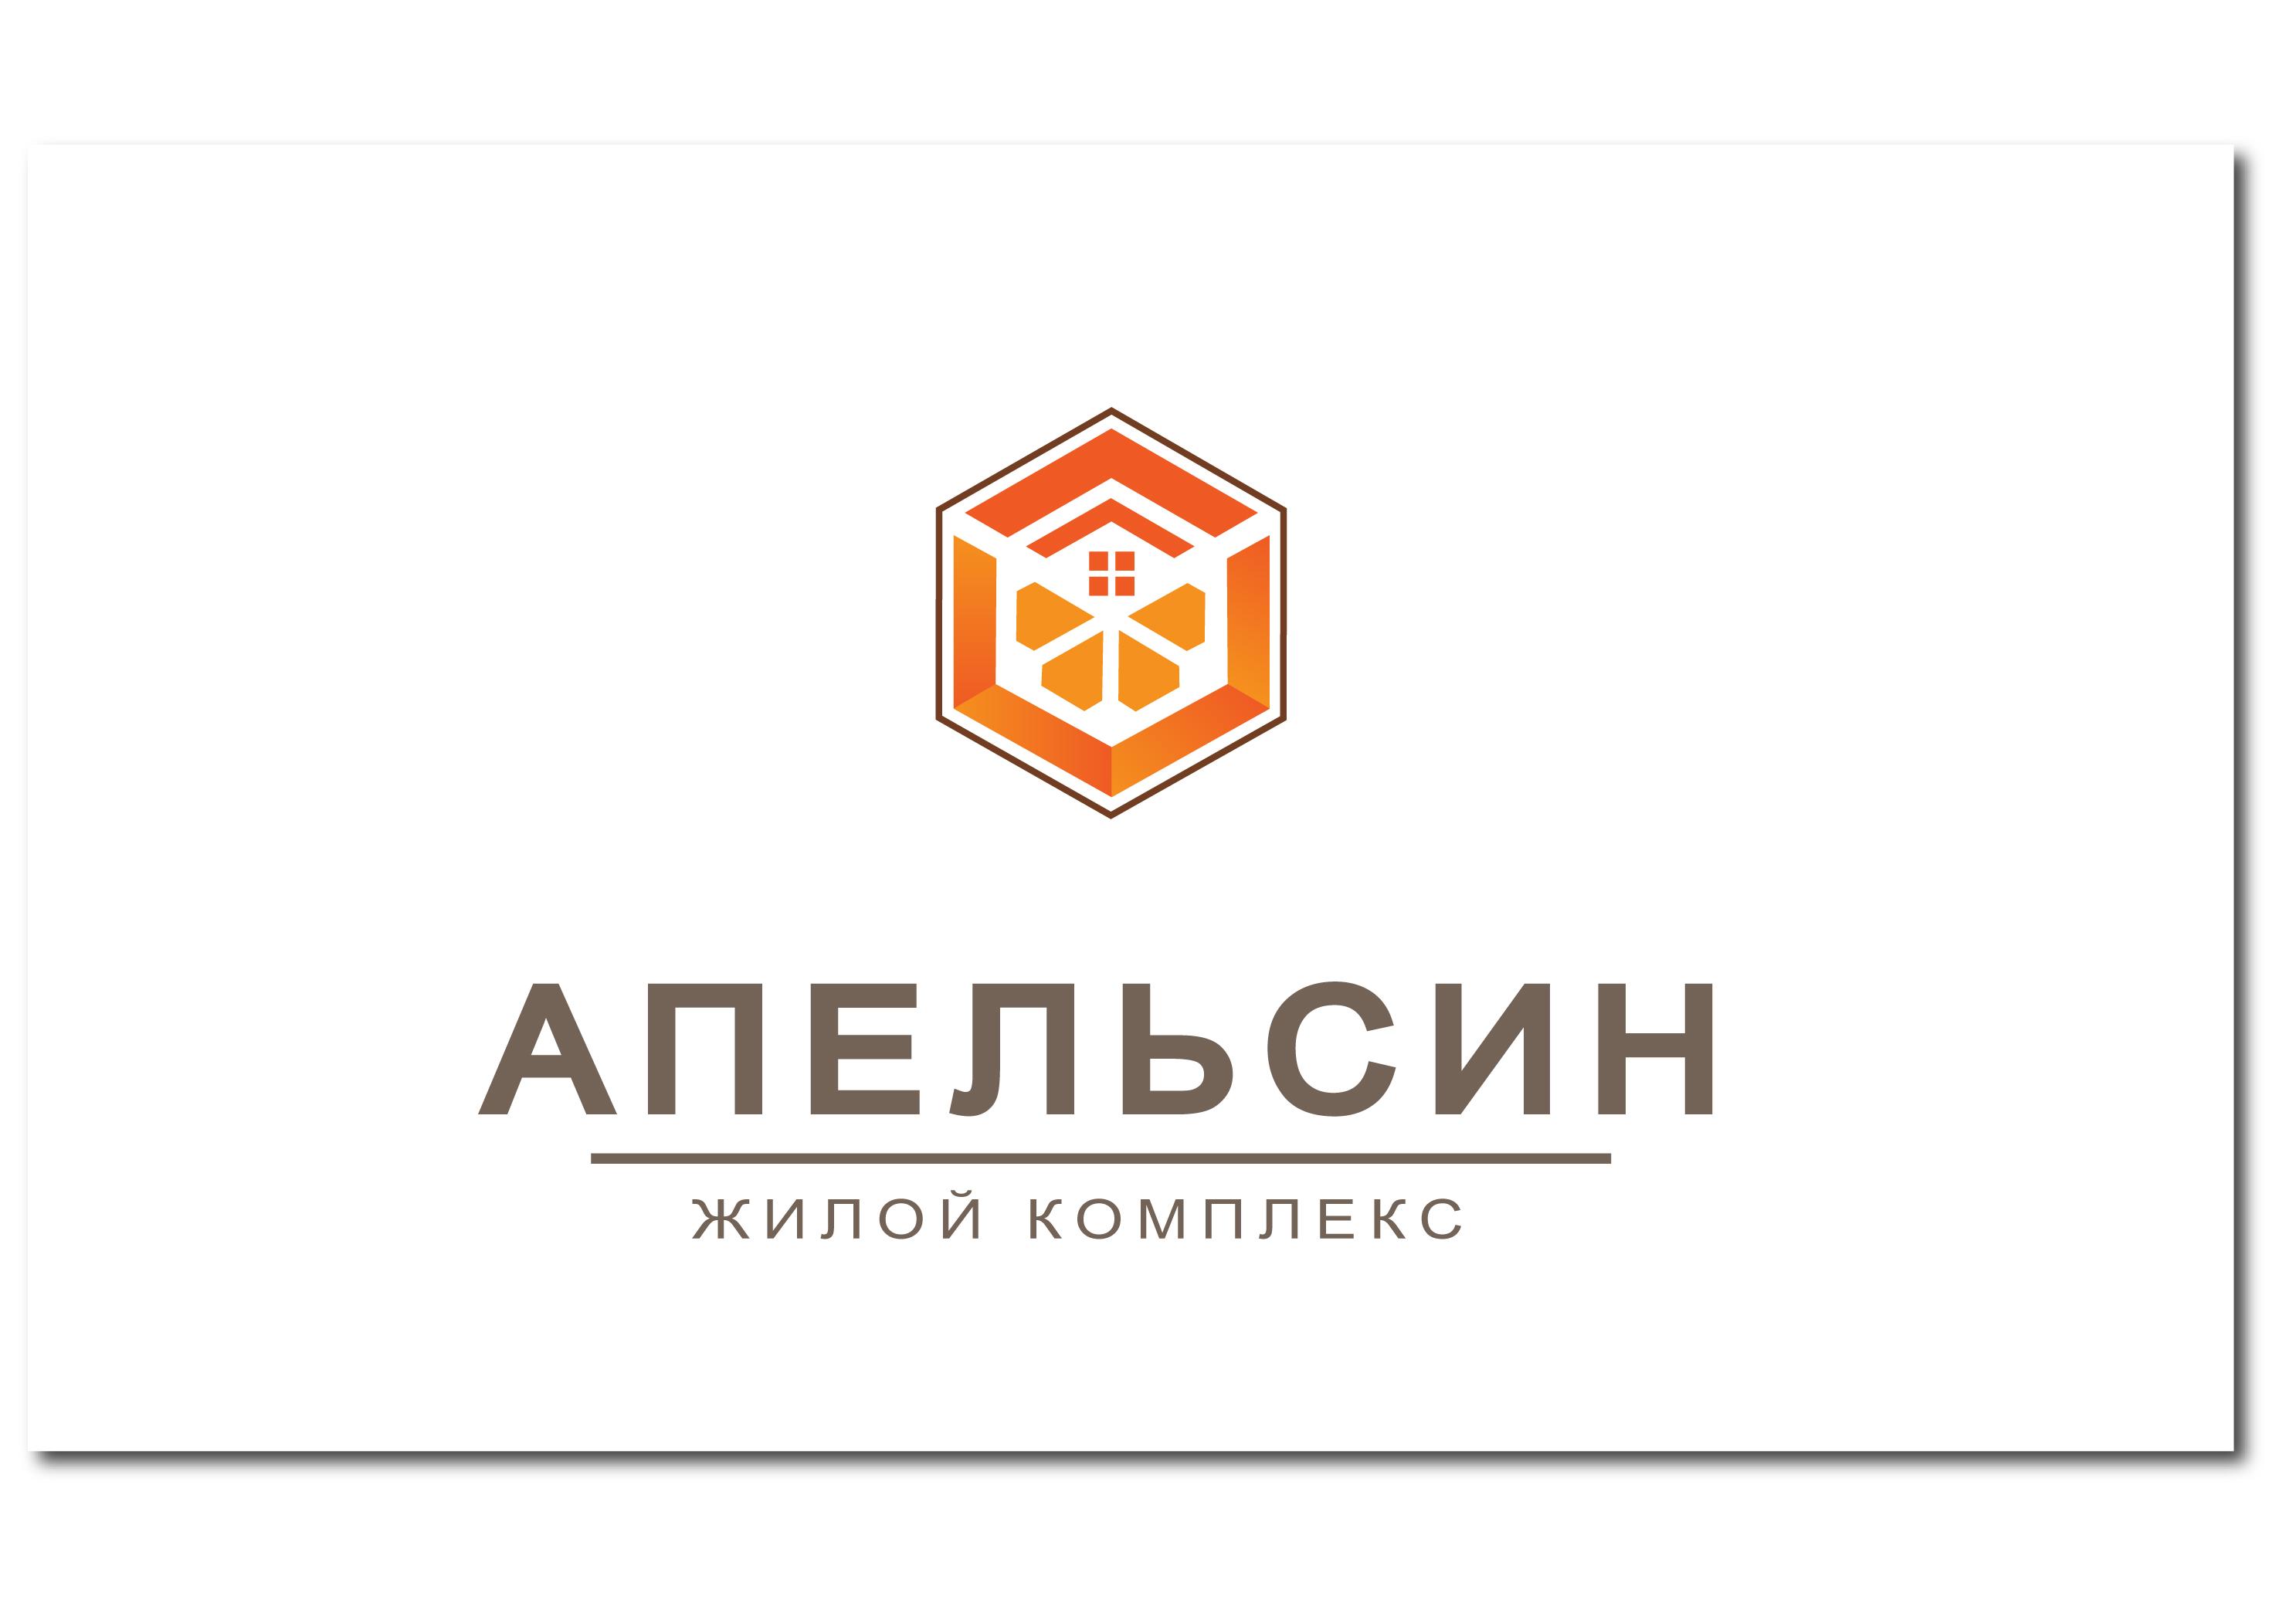 Логотип и фирменный стиль фото f_7645a722d9ddafd1.jpg